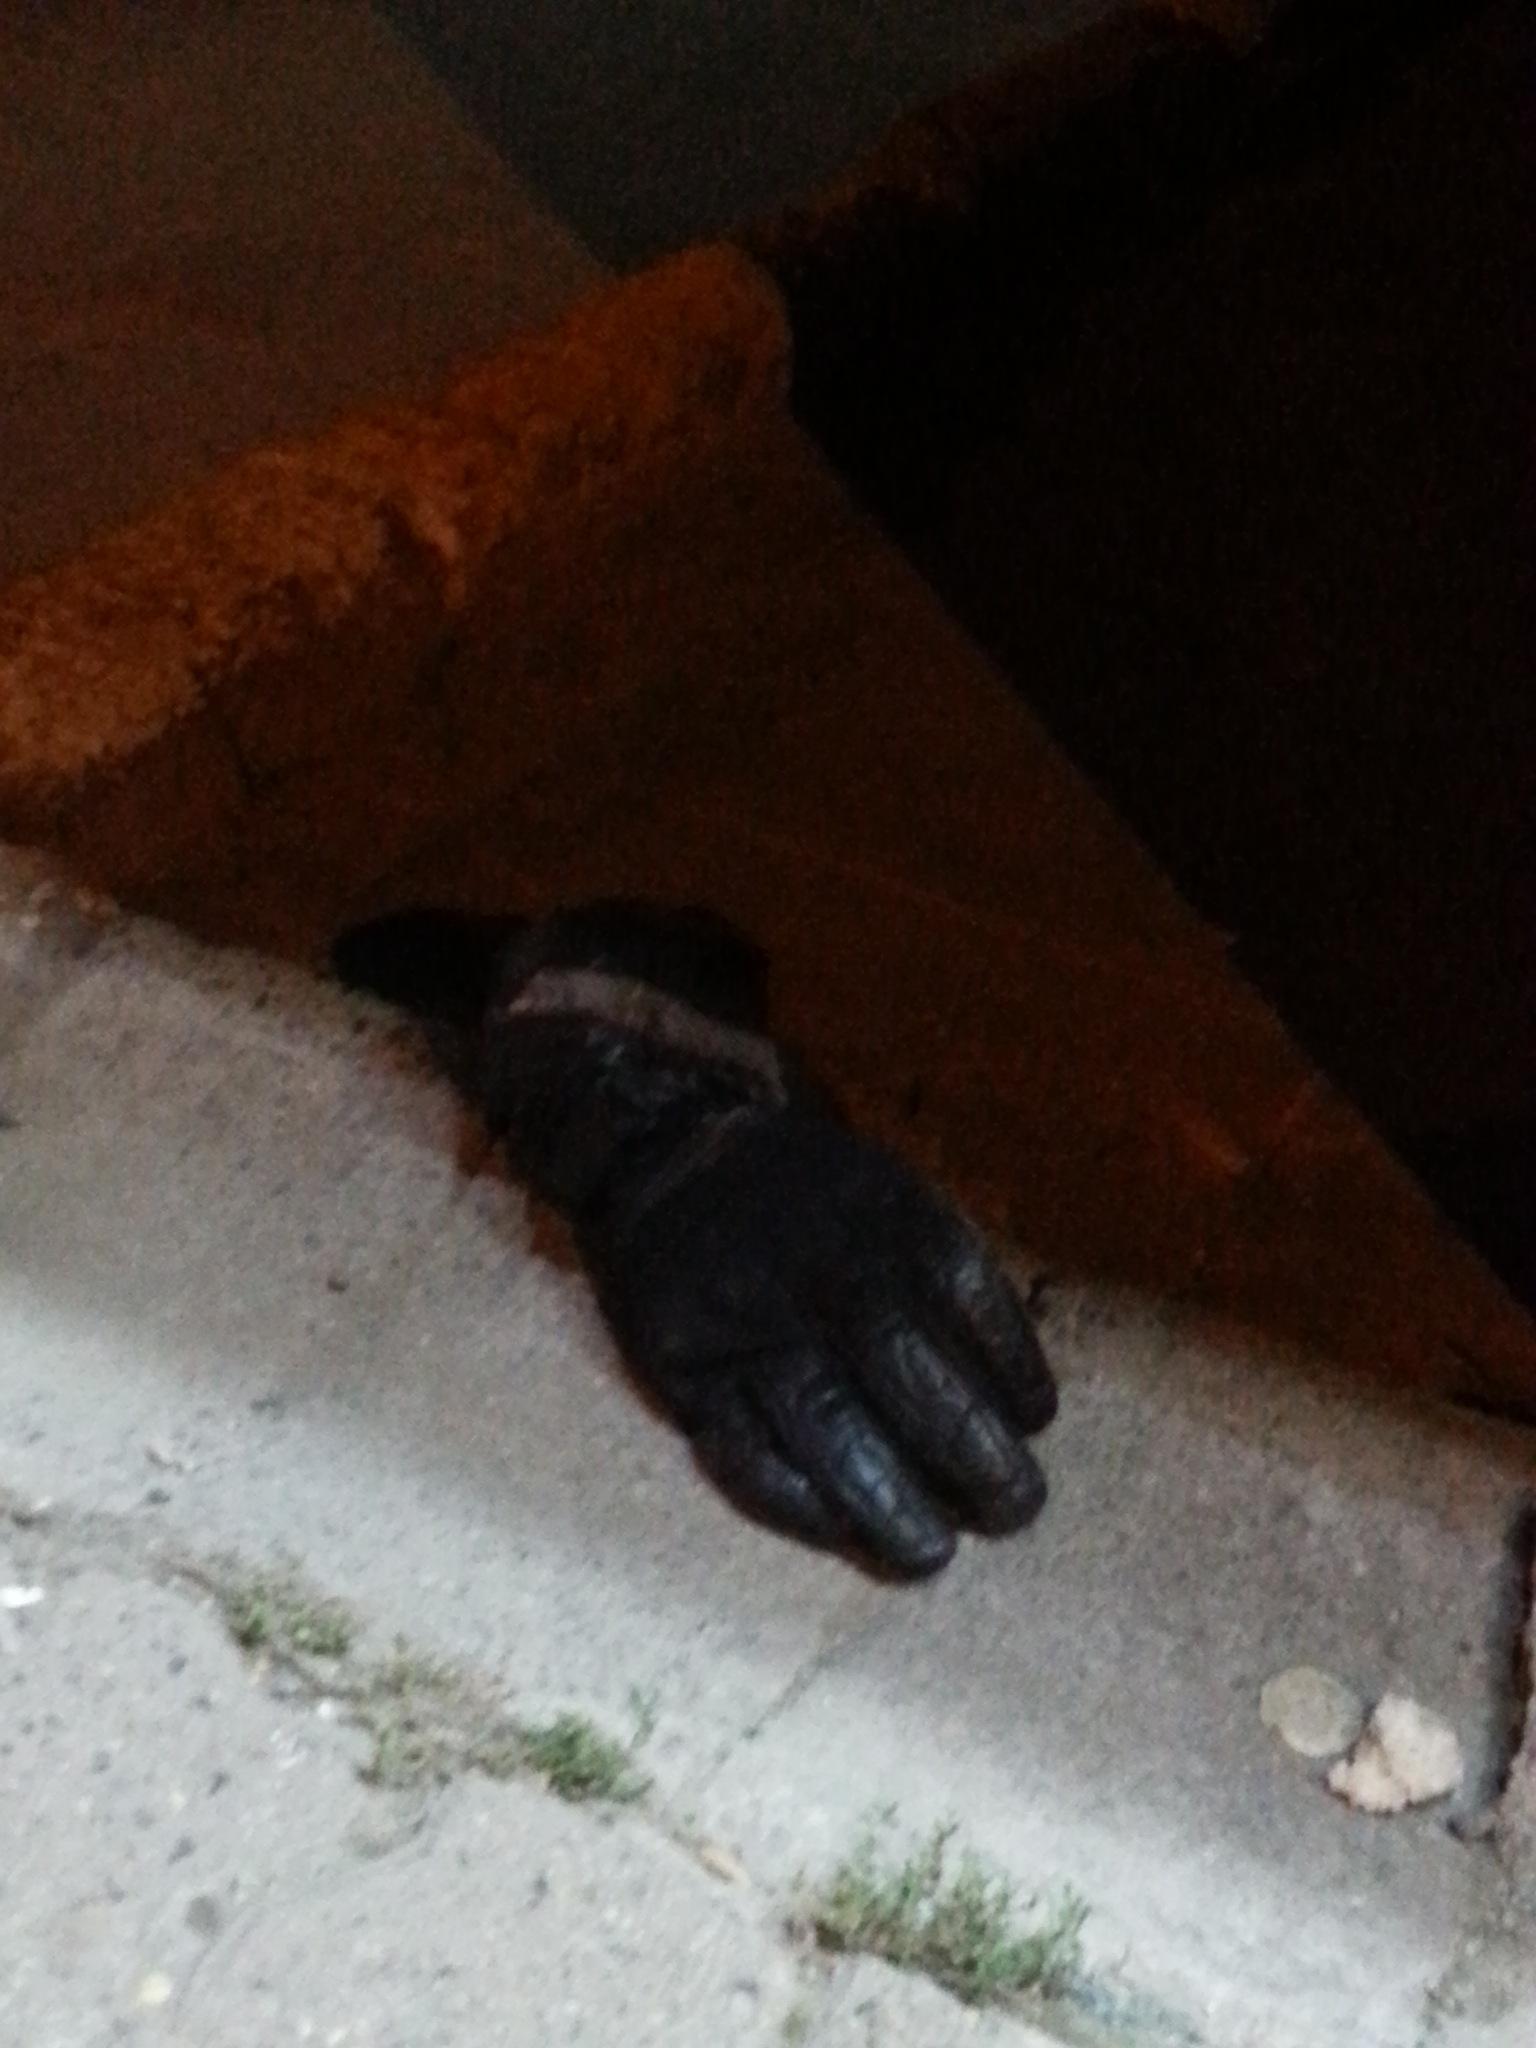 I see people with black gloves! by Demet Alper